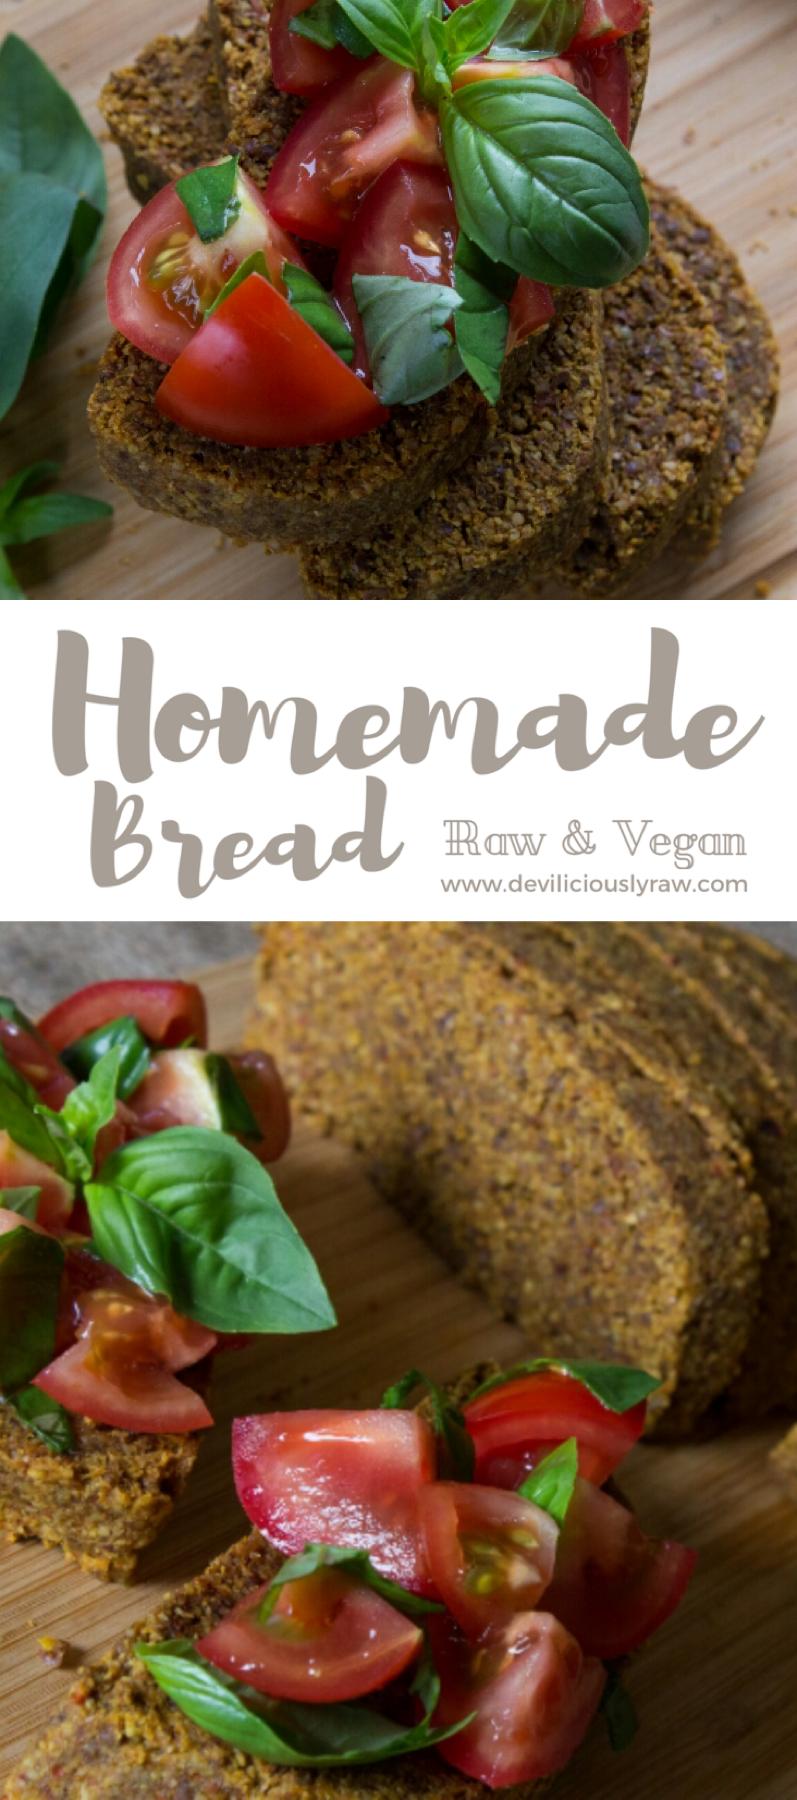 Homemade Raw Vegan Bread